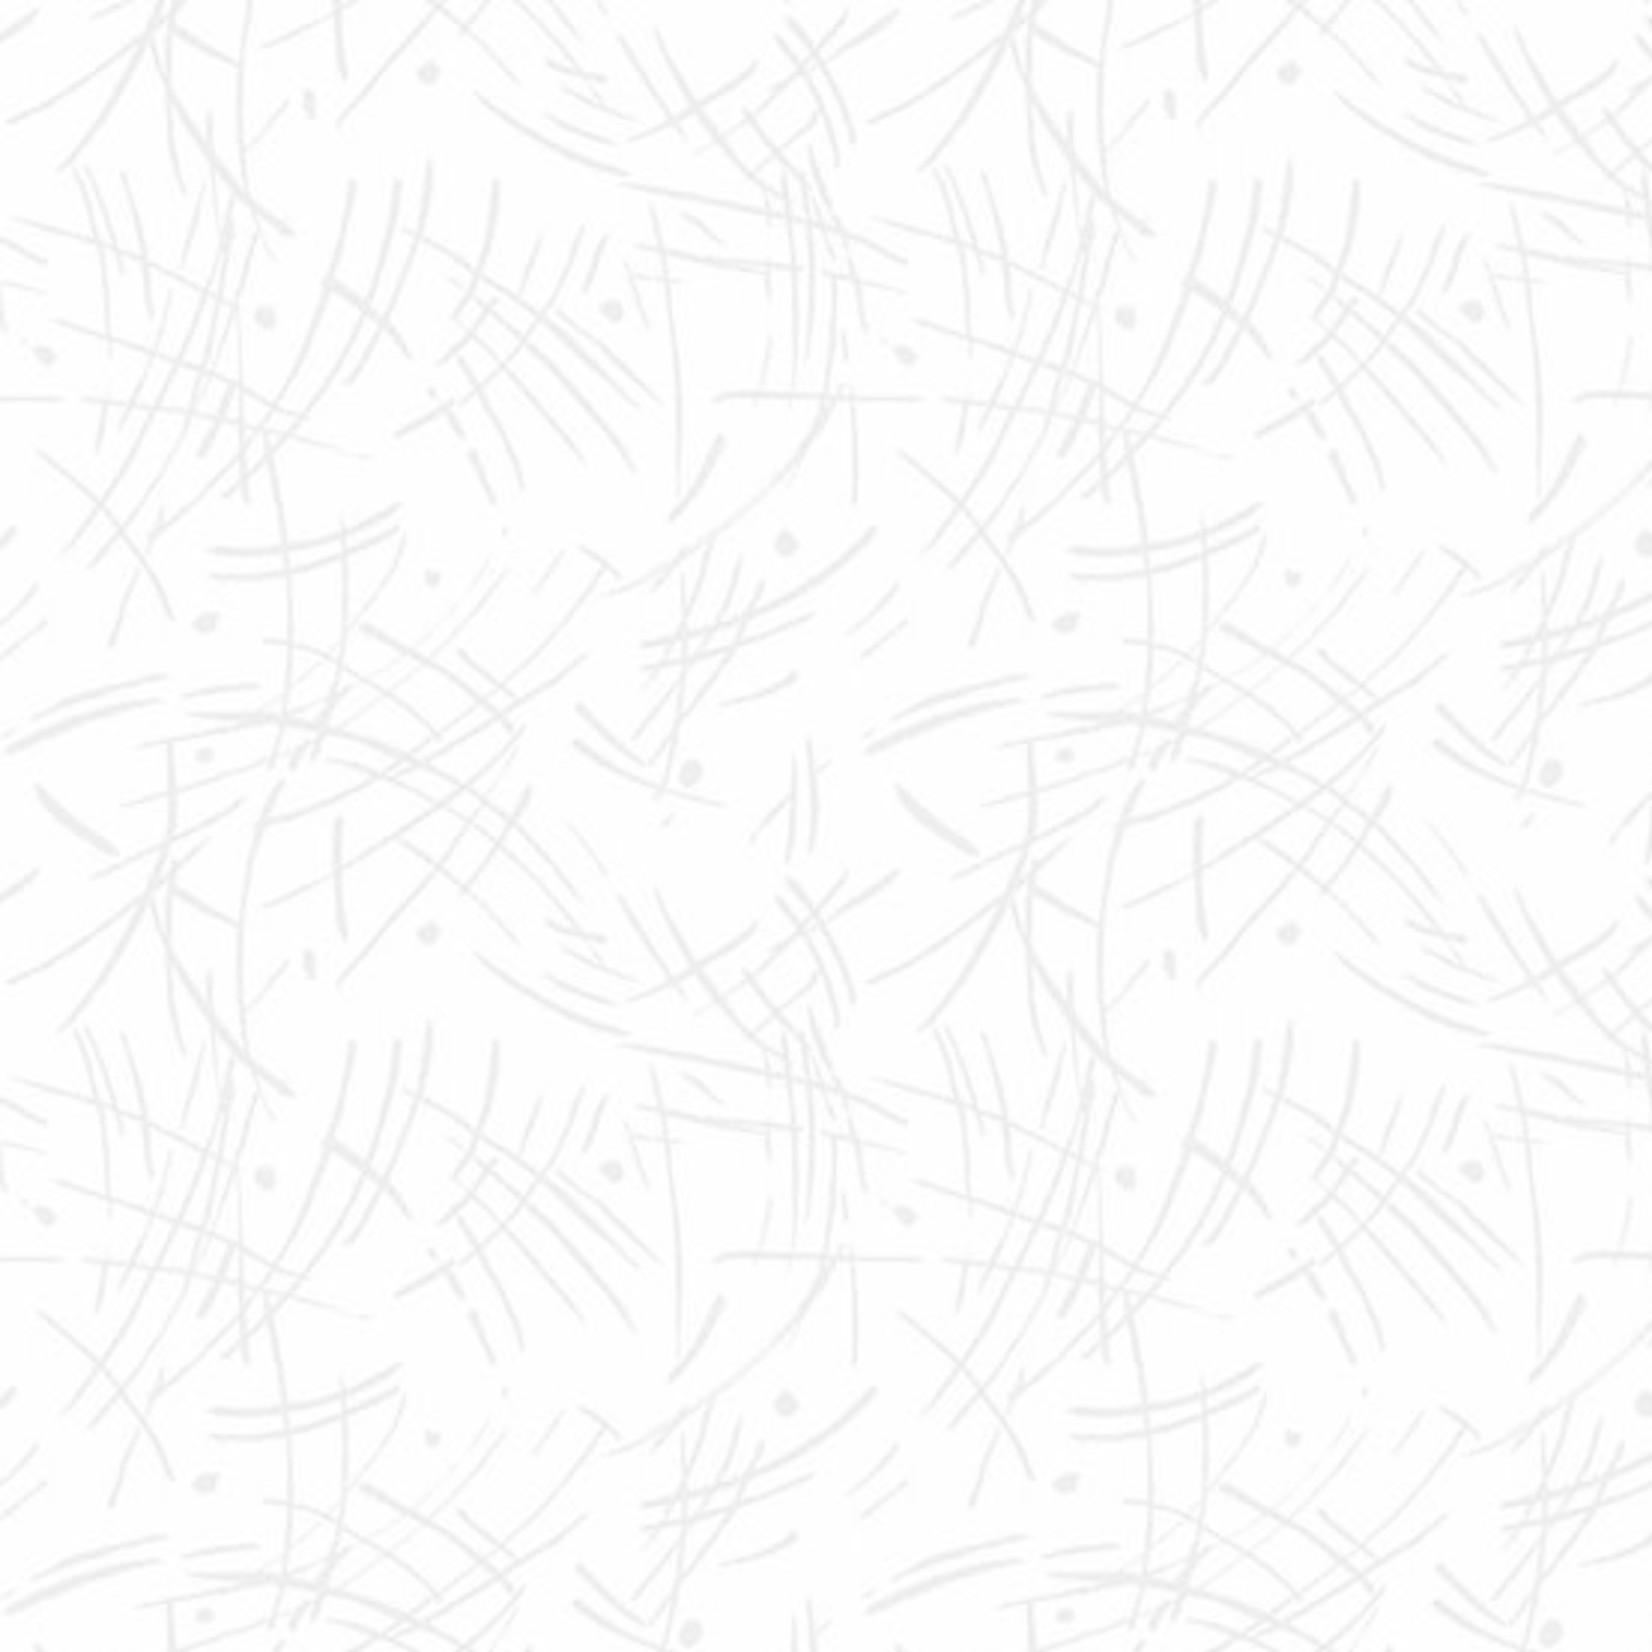 ANDOVER Century Whites, Strokes CS-9683-WW $0.18 per cm or $18/m